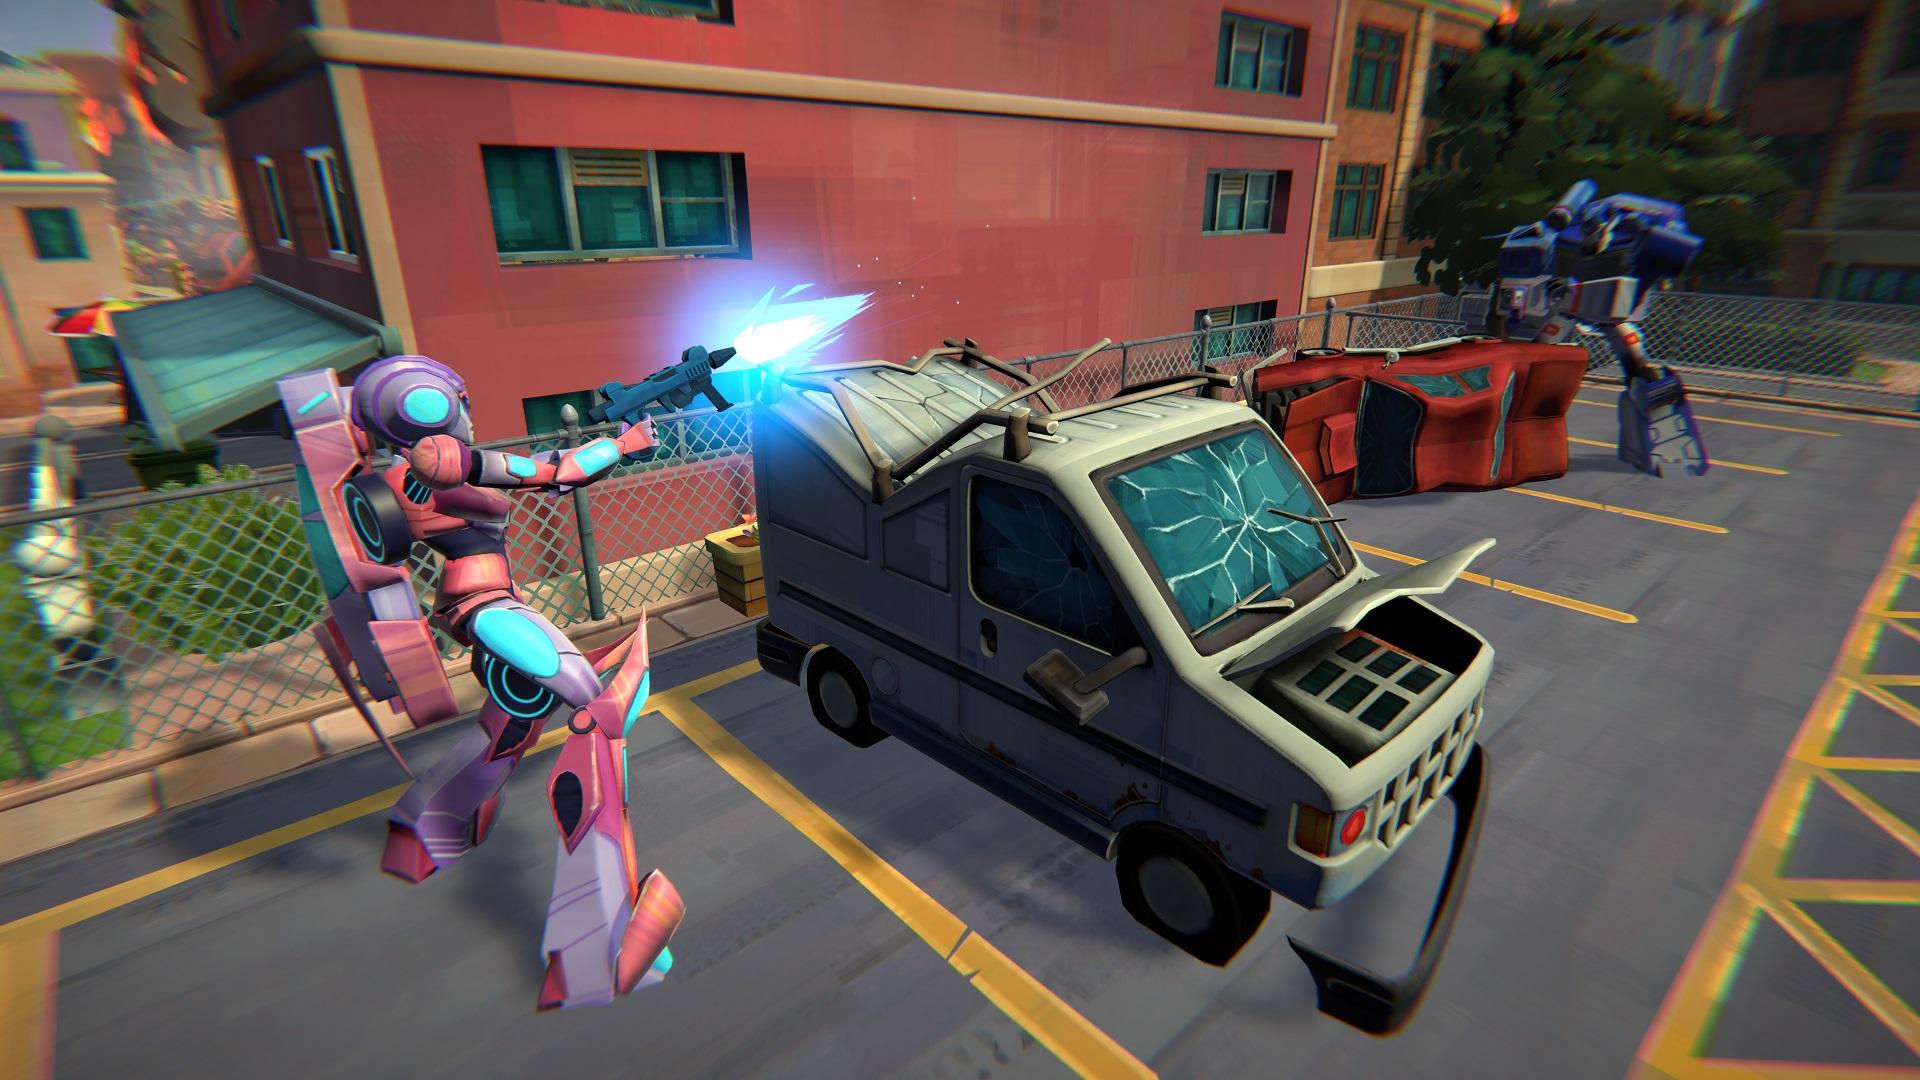 Transformers meets XCOM in less than a month screenshot